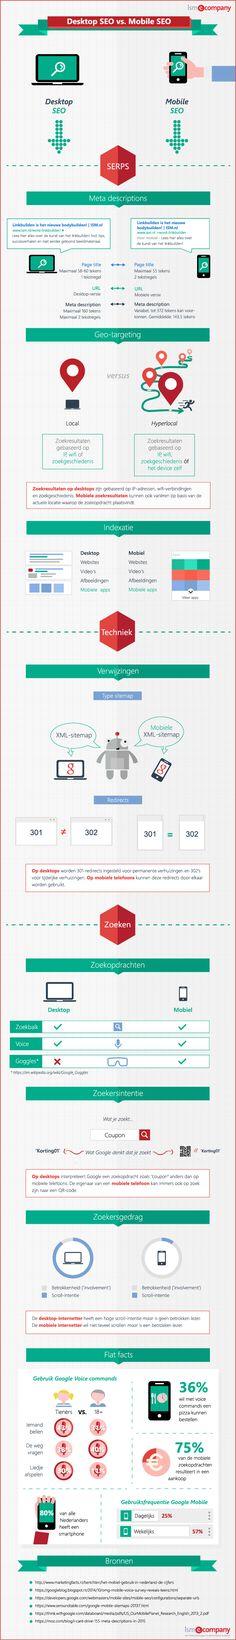 Infographic -ISM-blog -mobiel -vs -desktop 2_expanded _definitief -met -logo